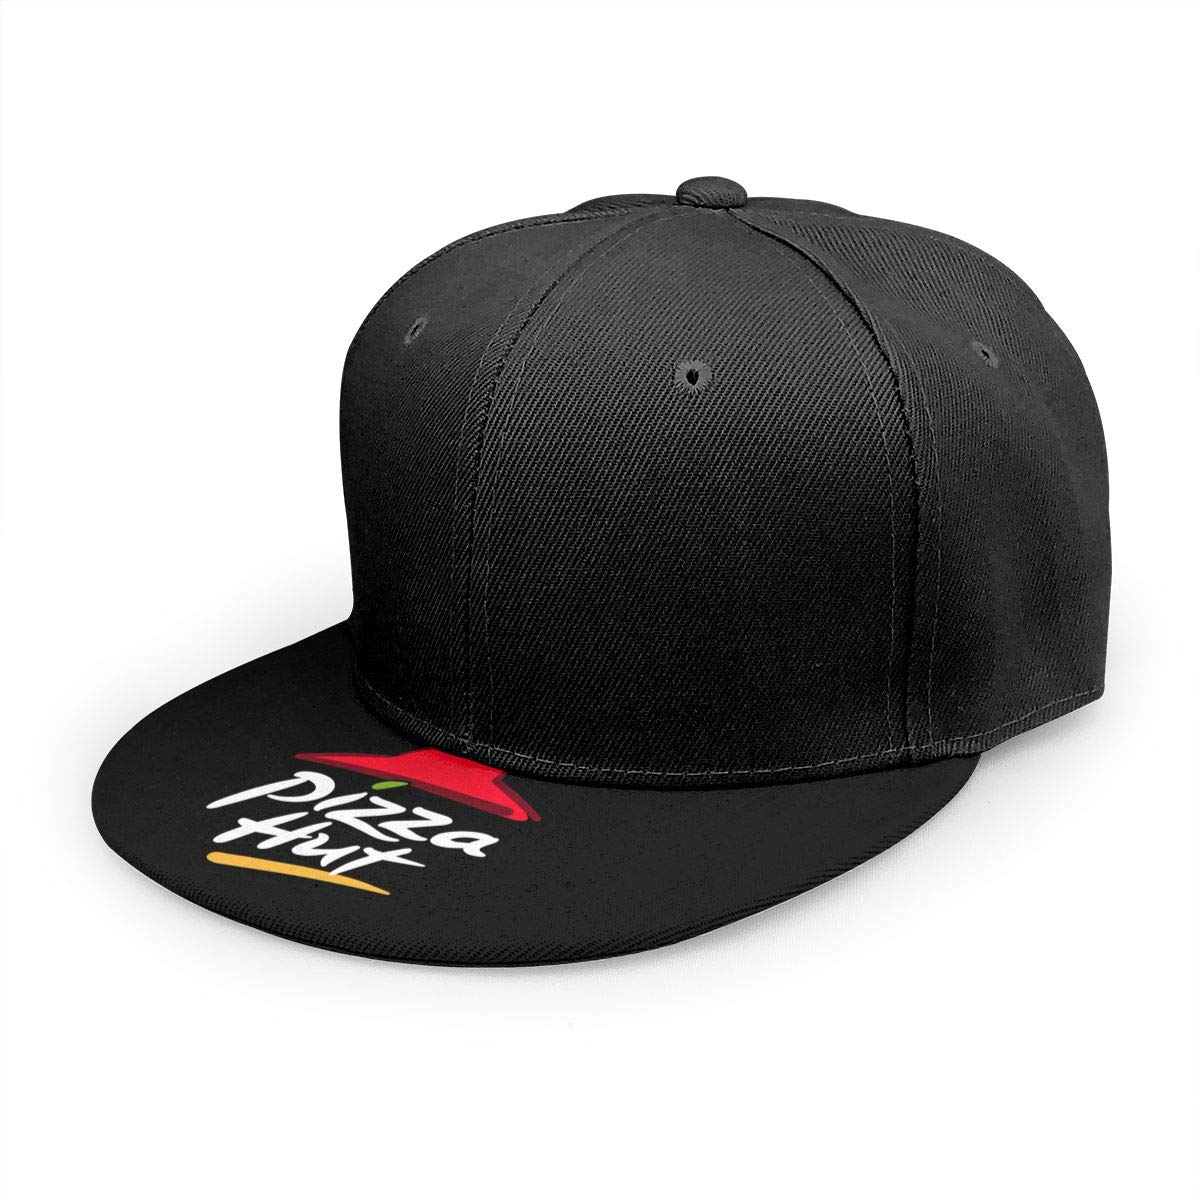 Adjustable Women Men Pizza-Hut-Logo Print Baseball Cap Flat Brim Cap Hats Hip Hop Snapback Sun Hat Boys Girls Black by Apolonia